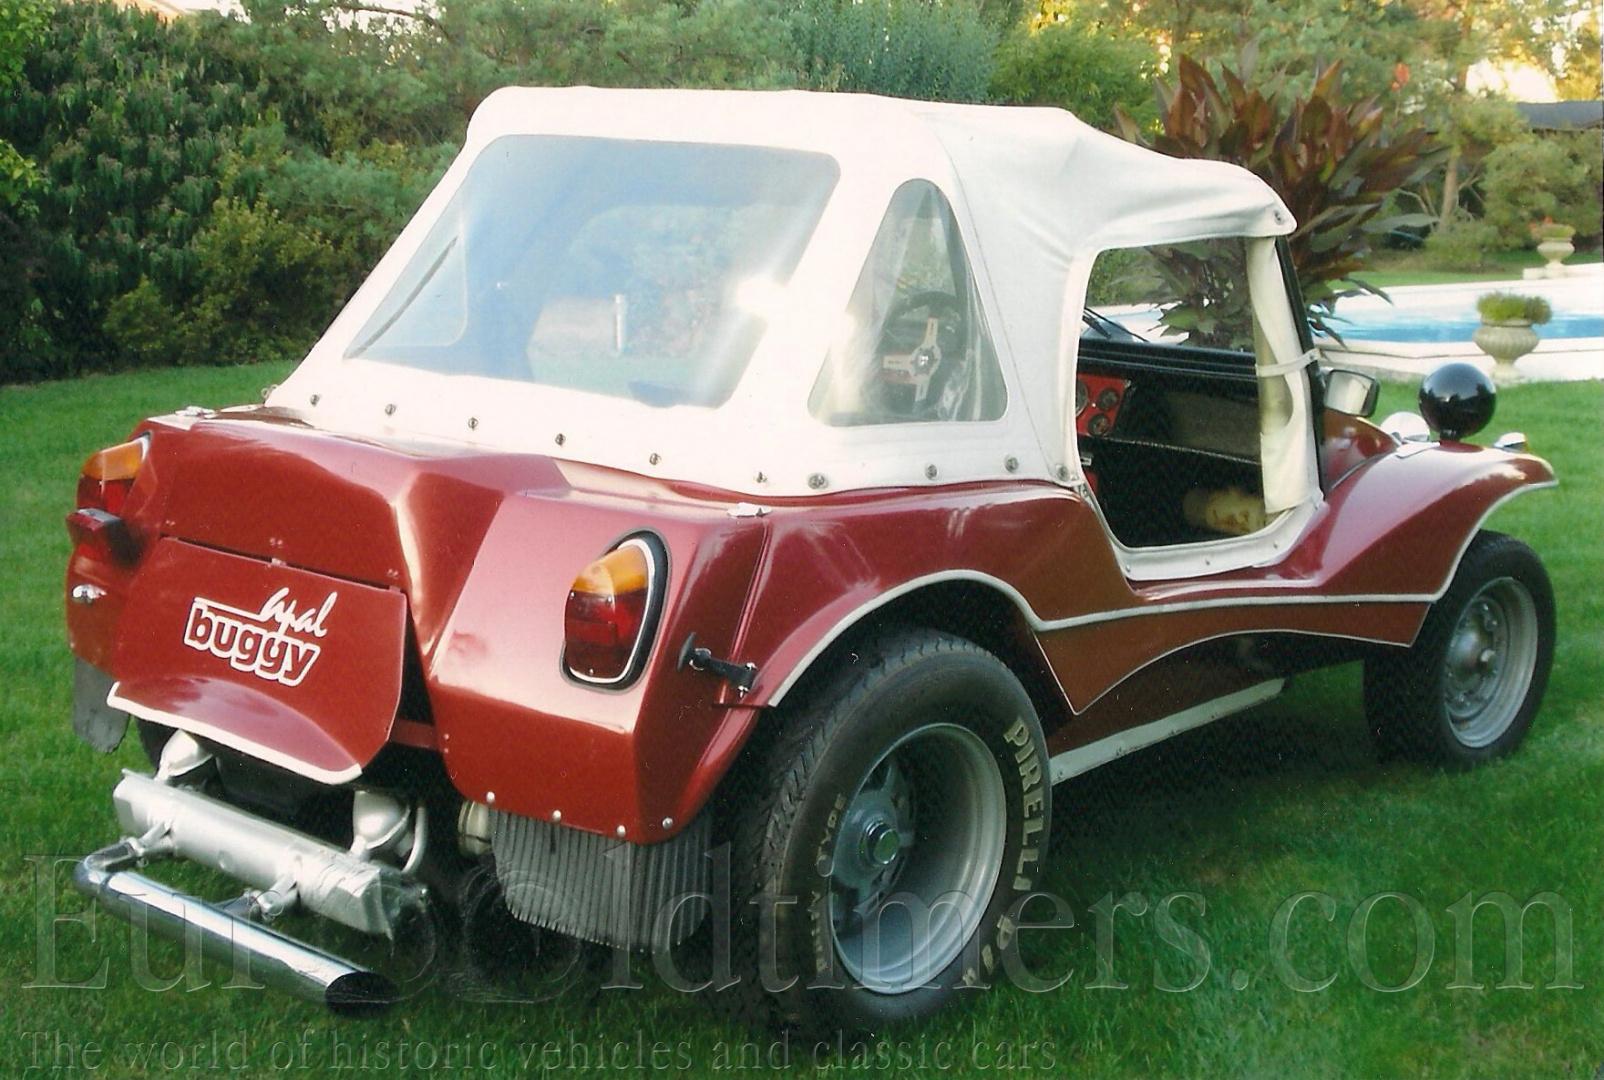 apal buggy